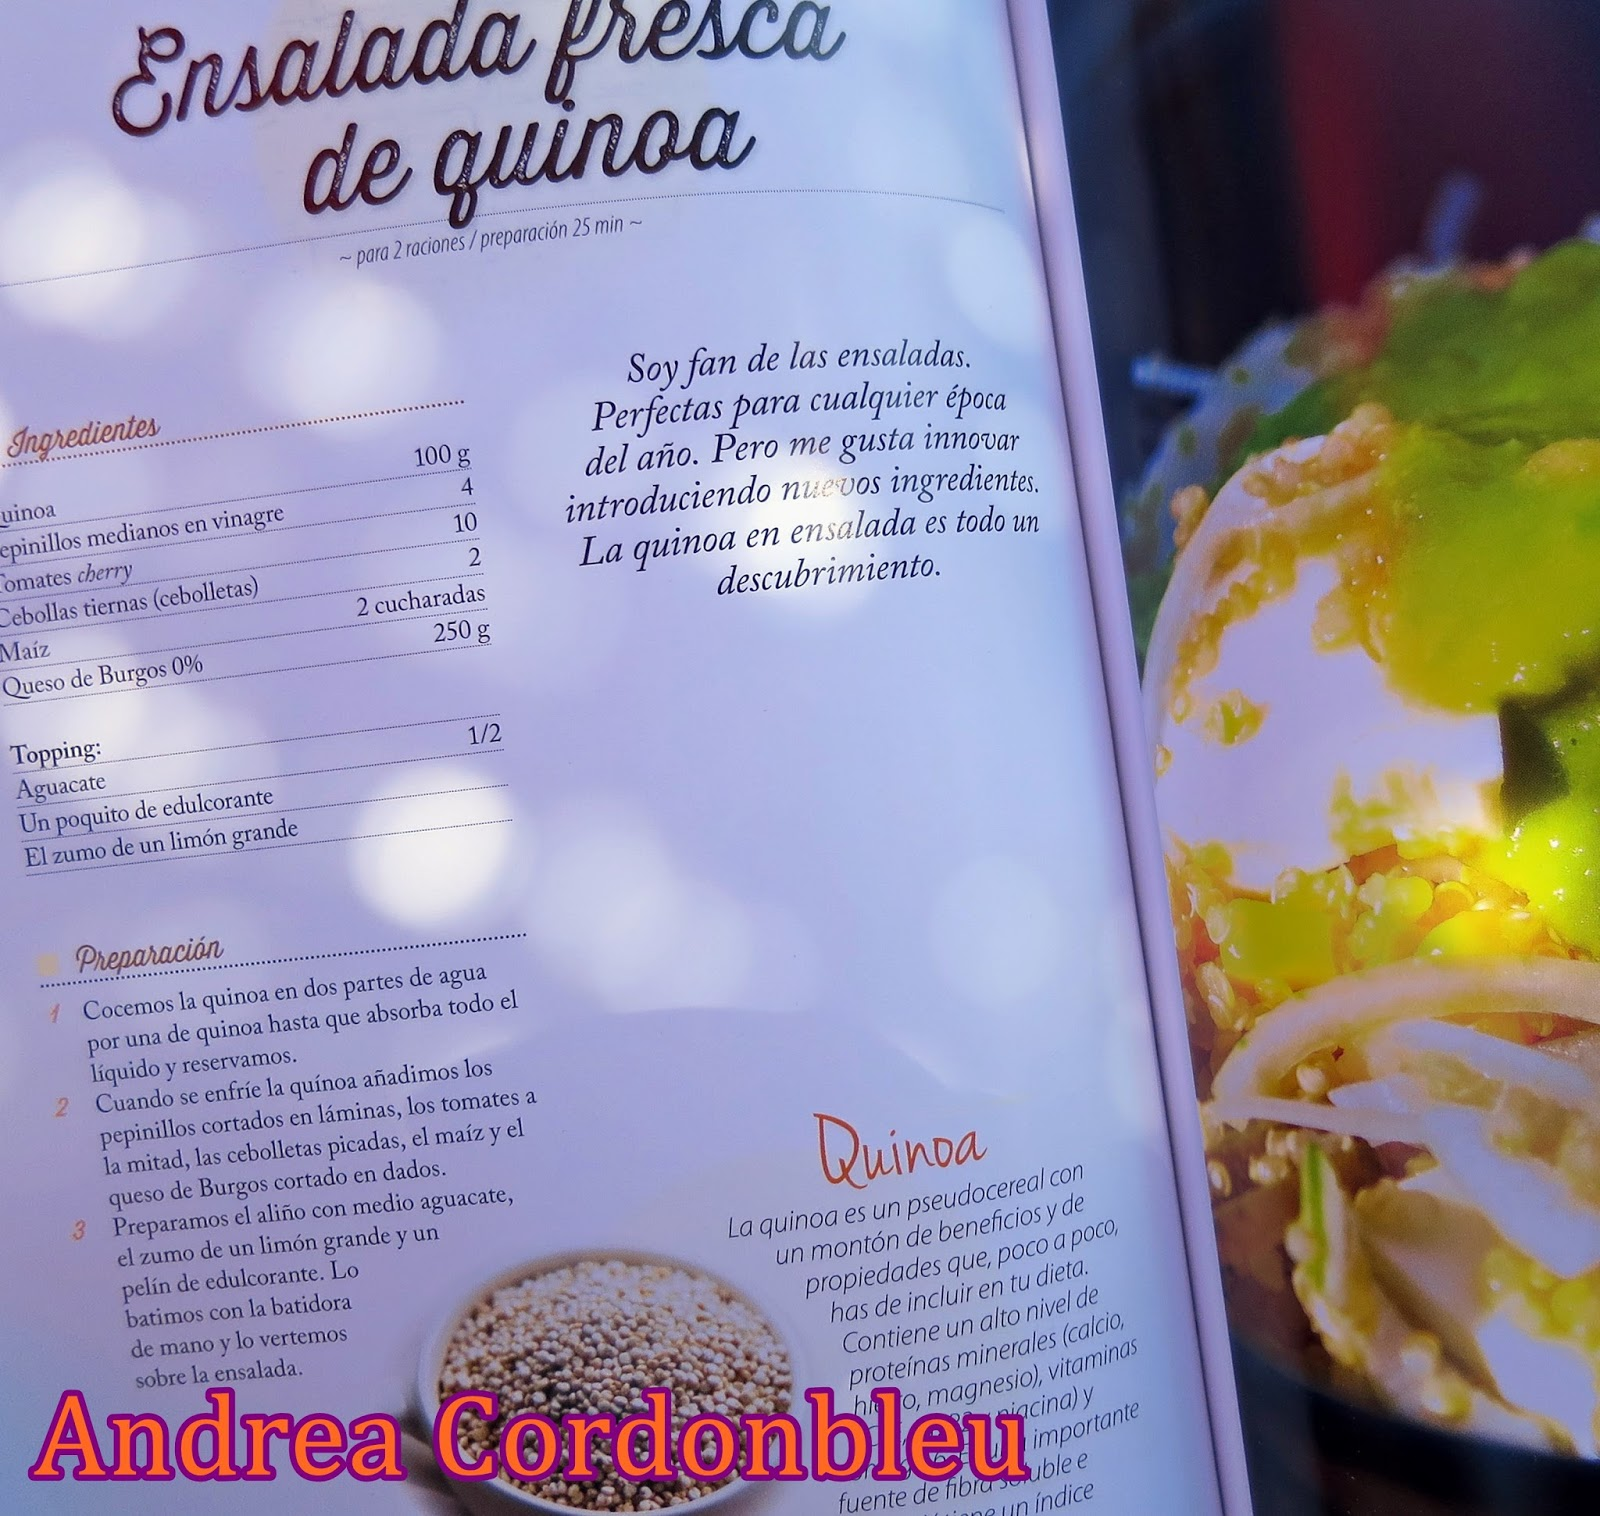 Cordonbleu ensalada fresca de amaranto sin gluten receta proteica vegetariana - La cocina fit de vikika pdf ...